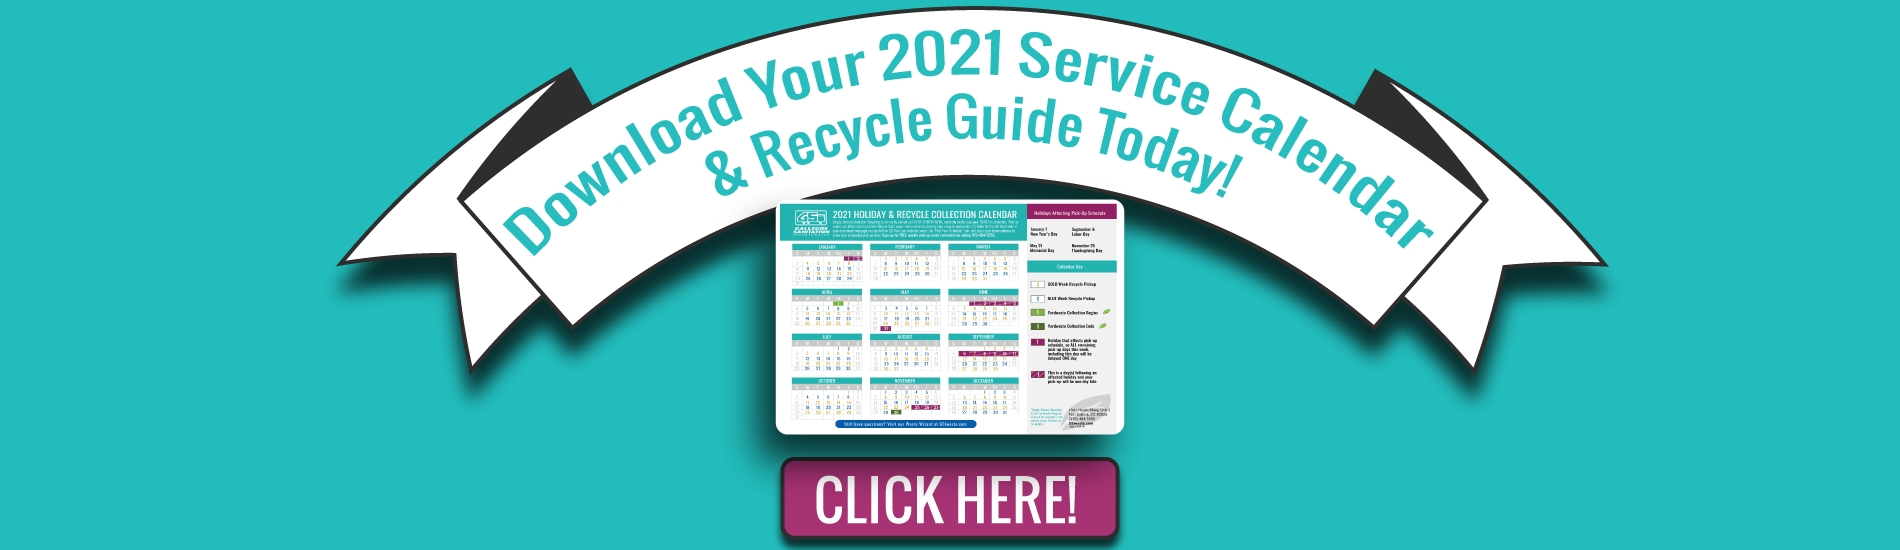 Website-Graphic_Service-Calendar-2021-Final 1 - Gallegos